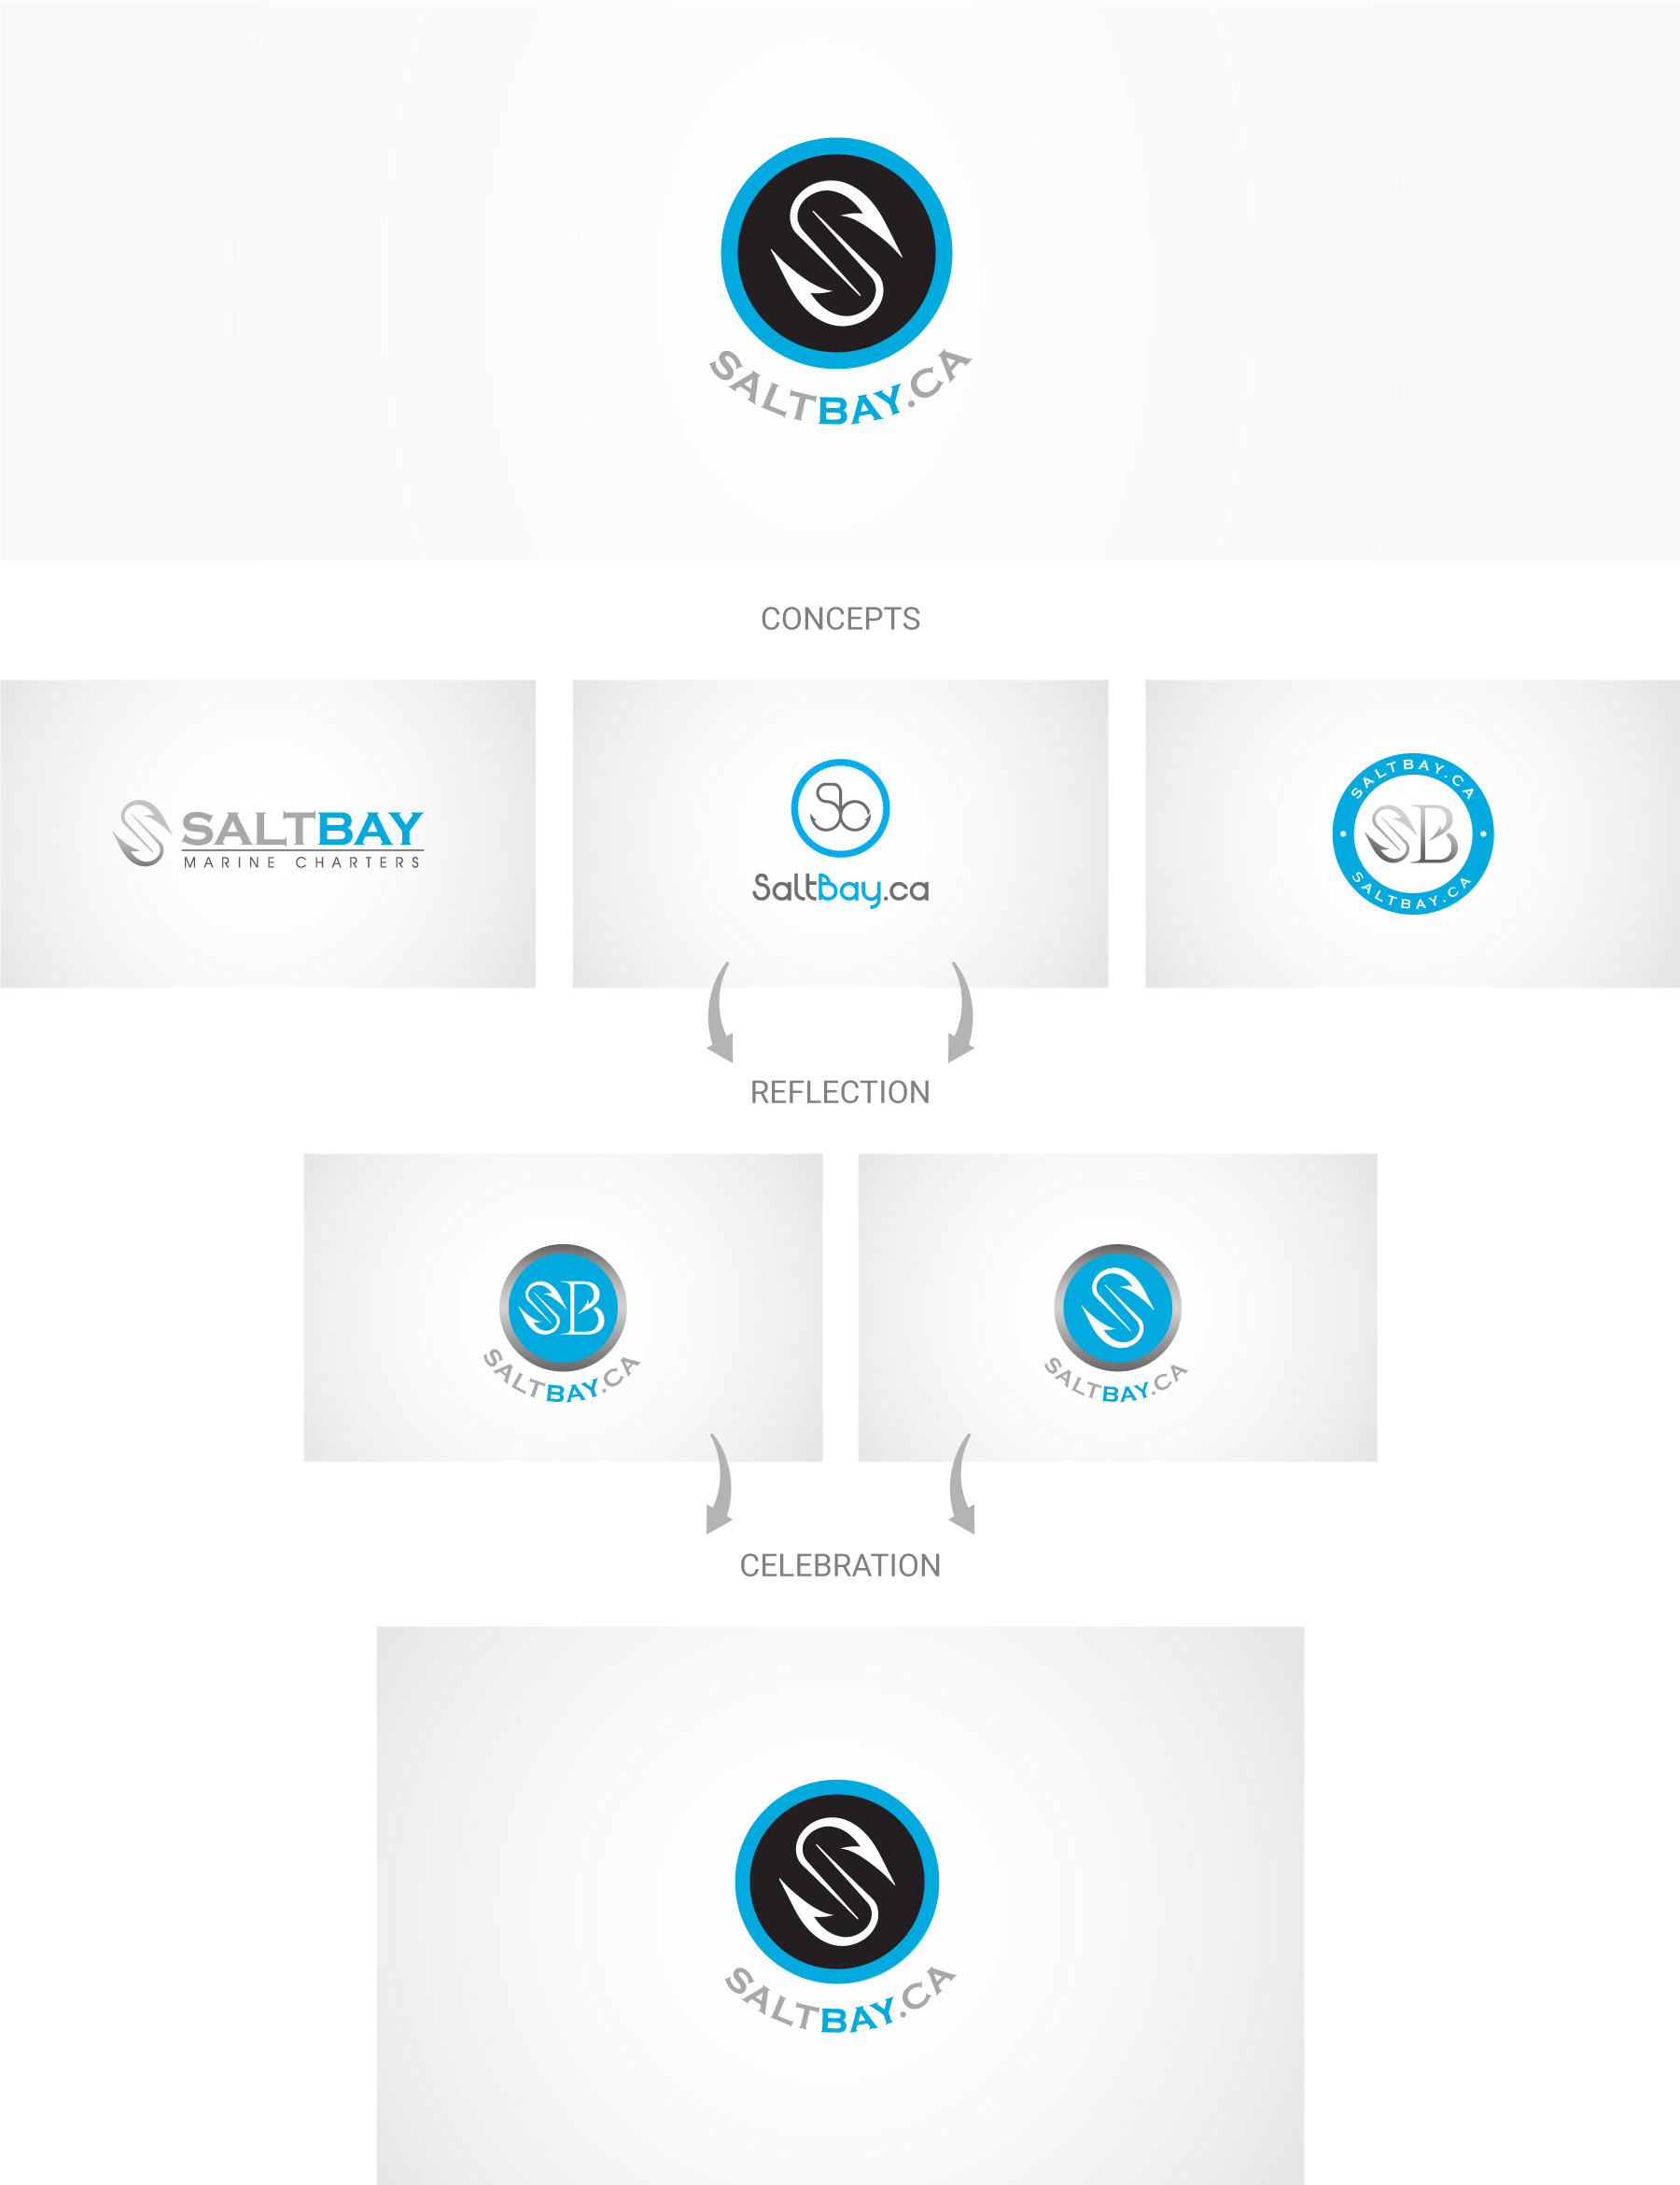 Saltbay-logo-design